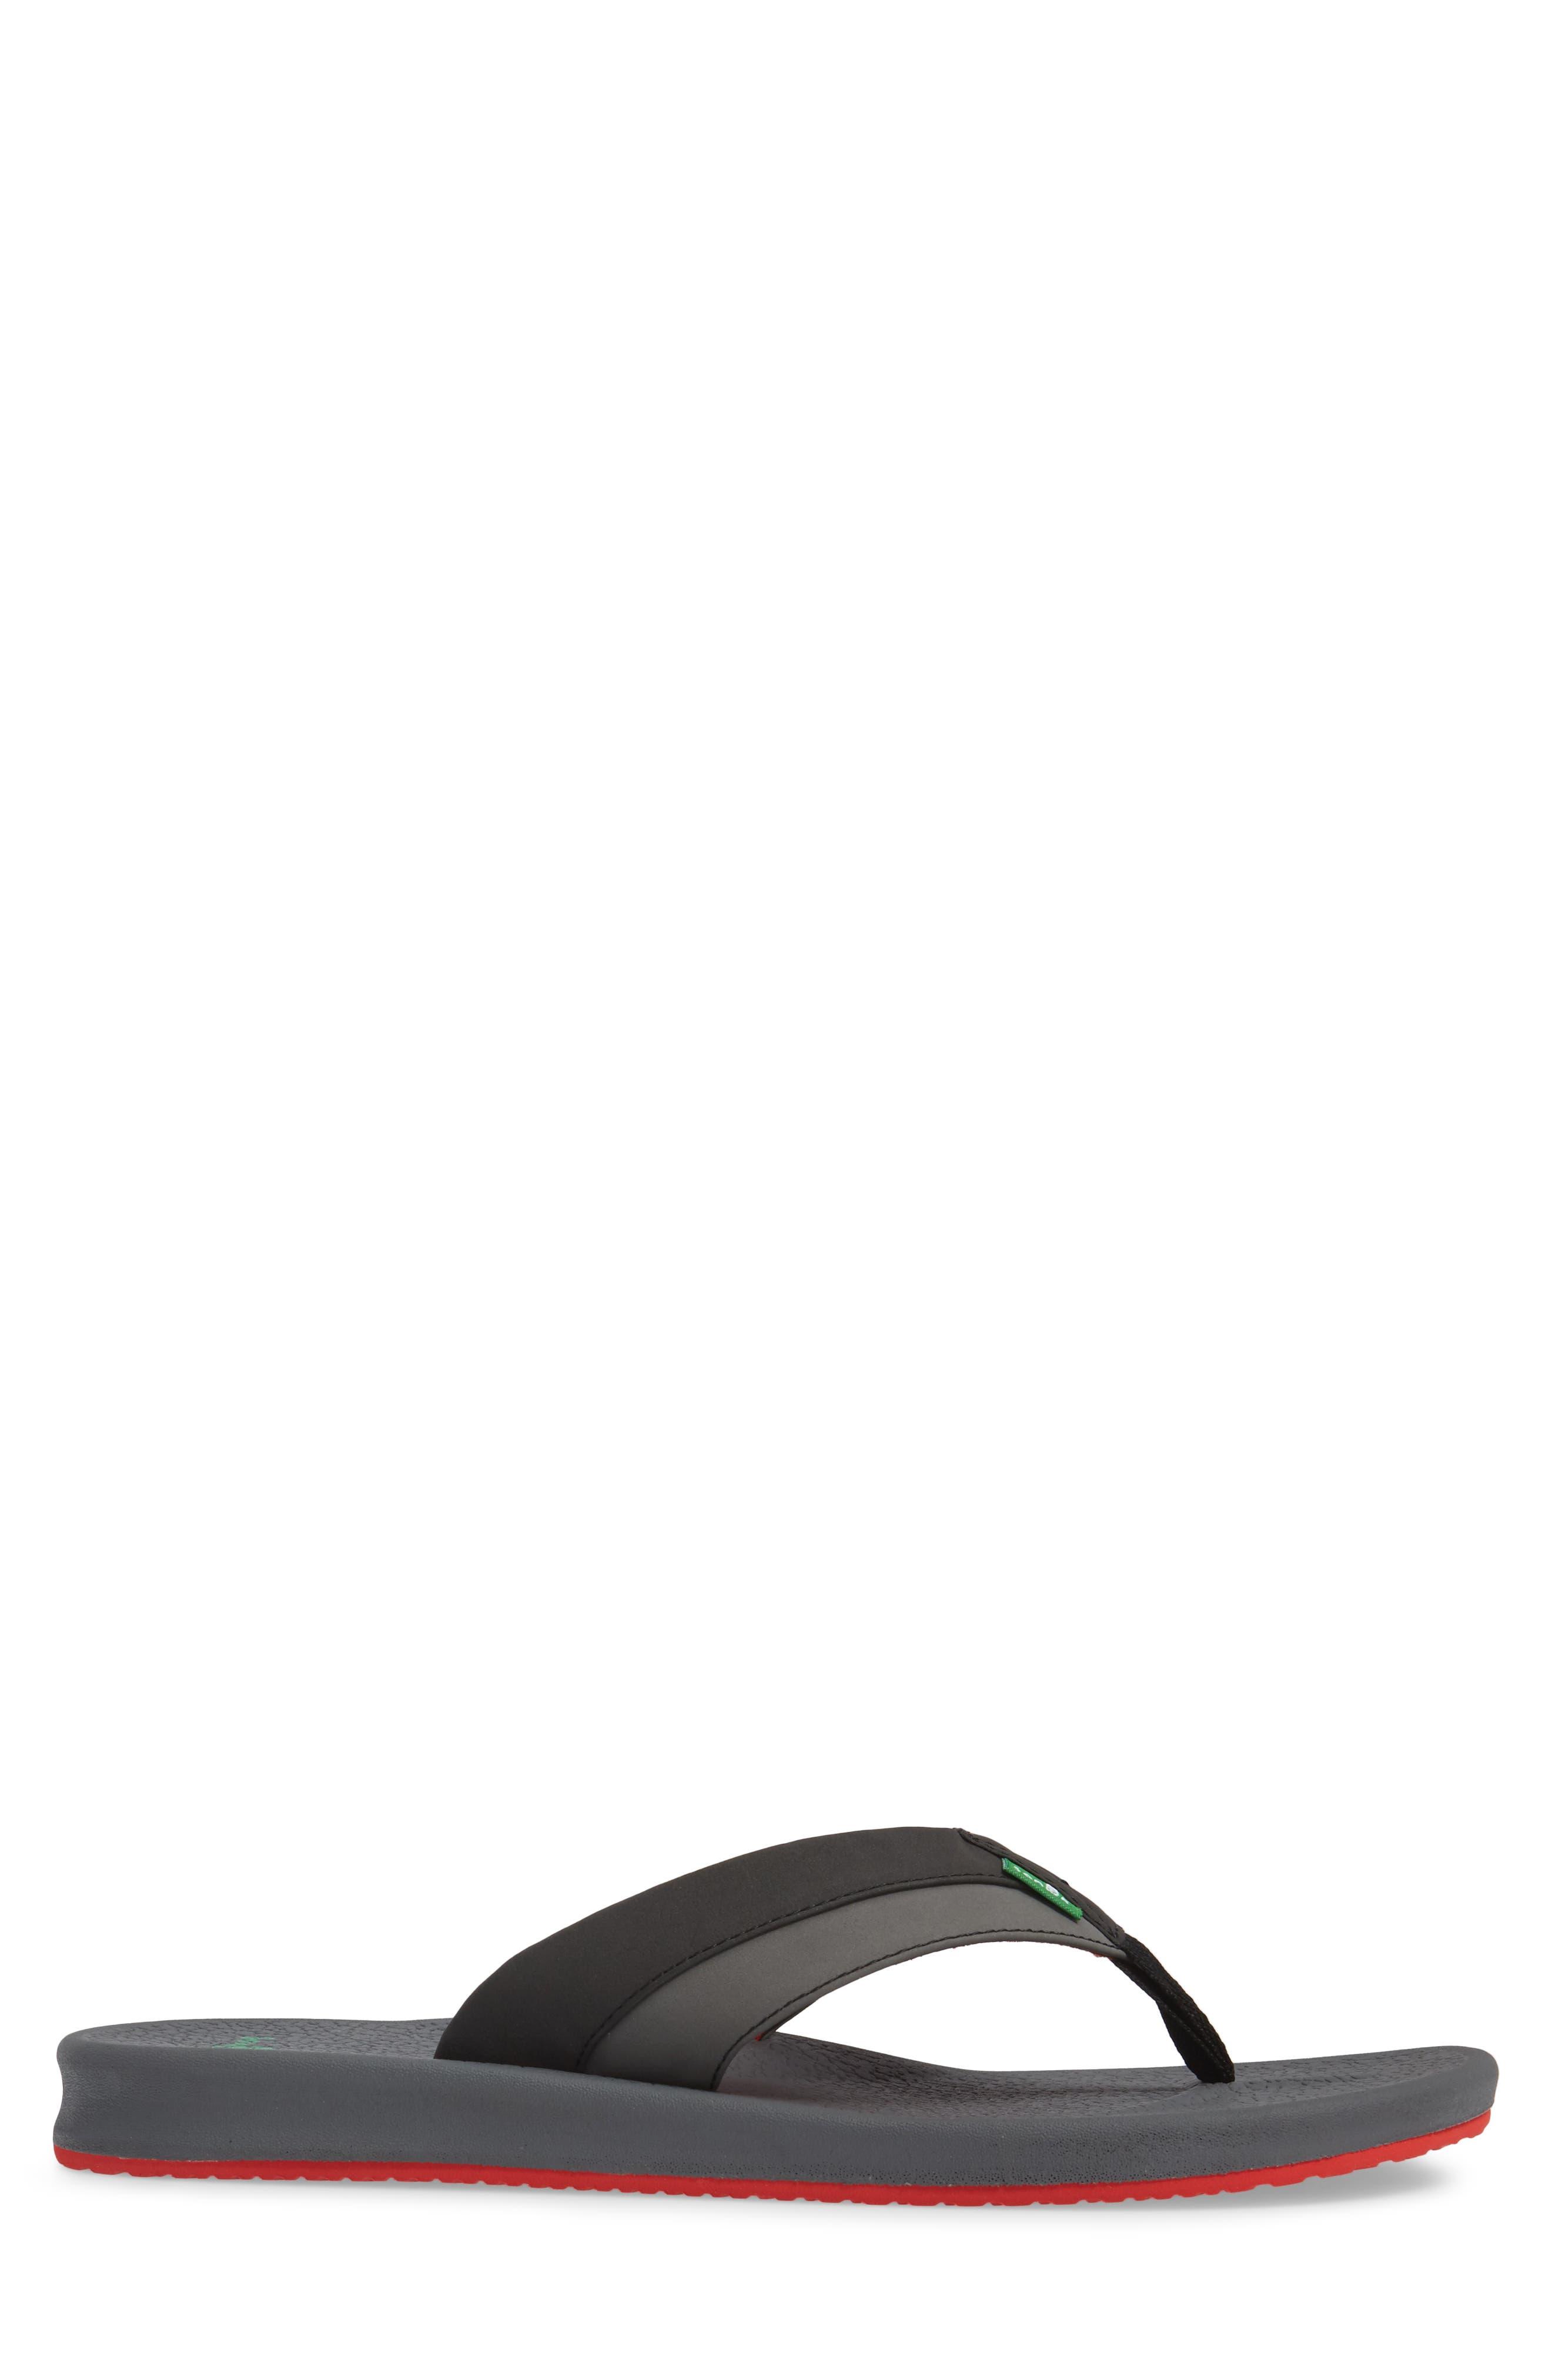 Brumeister Flip Flop,                             Alternate thumbnail 3, color,                             030